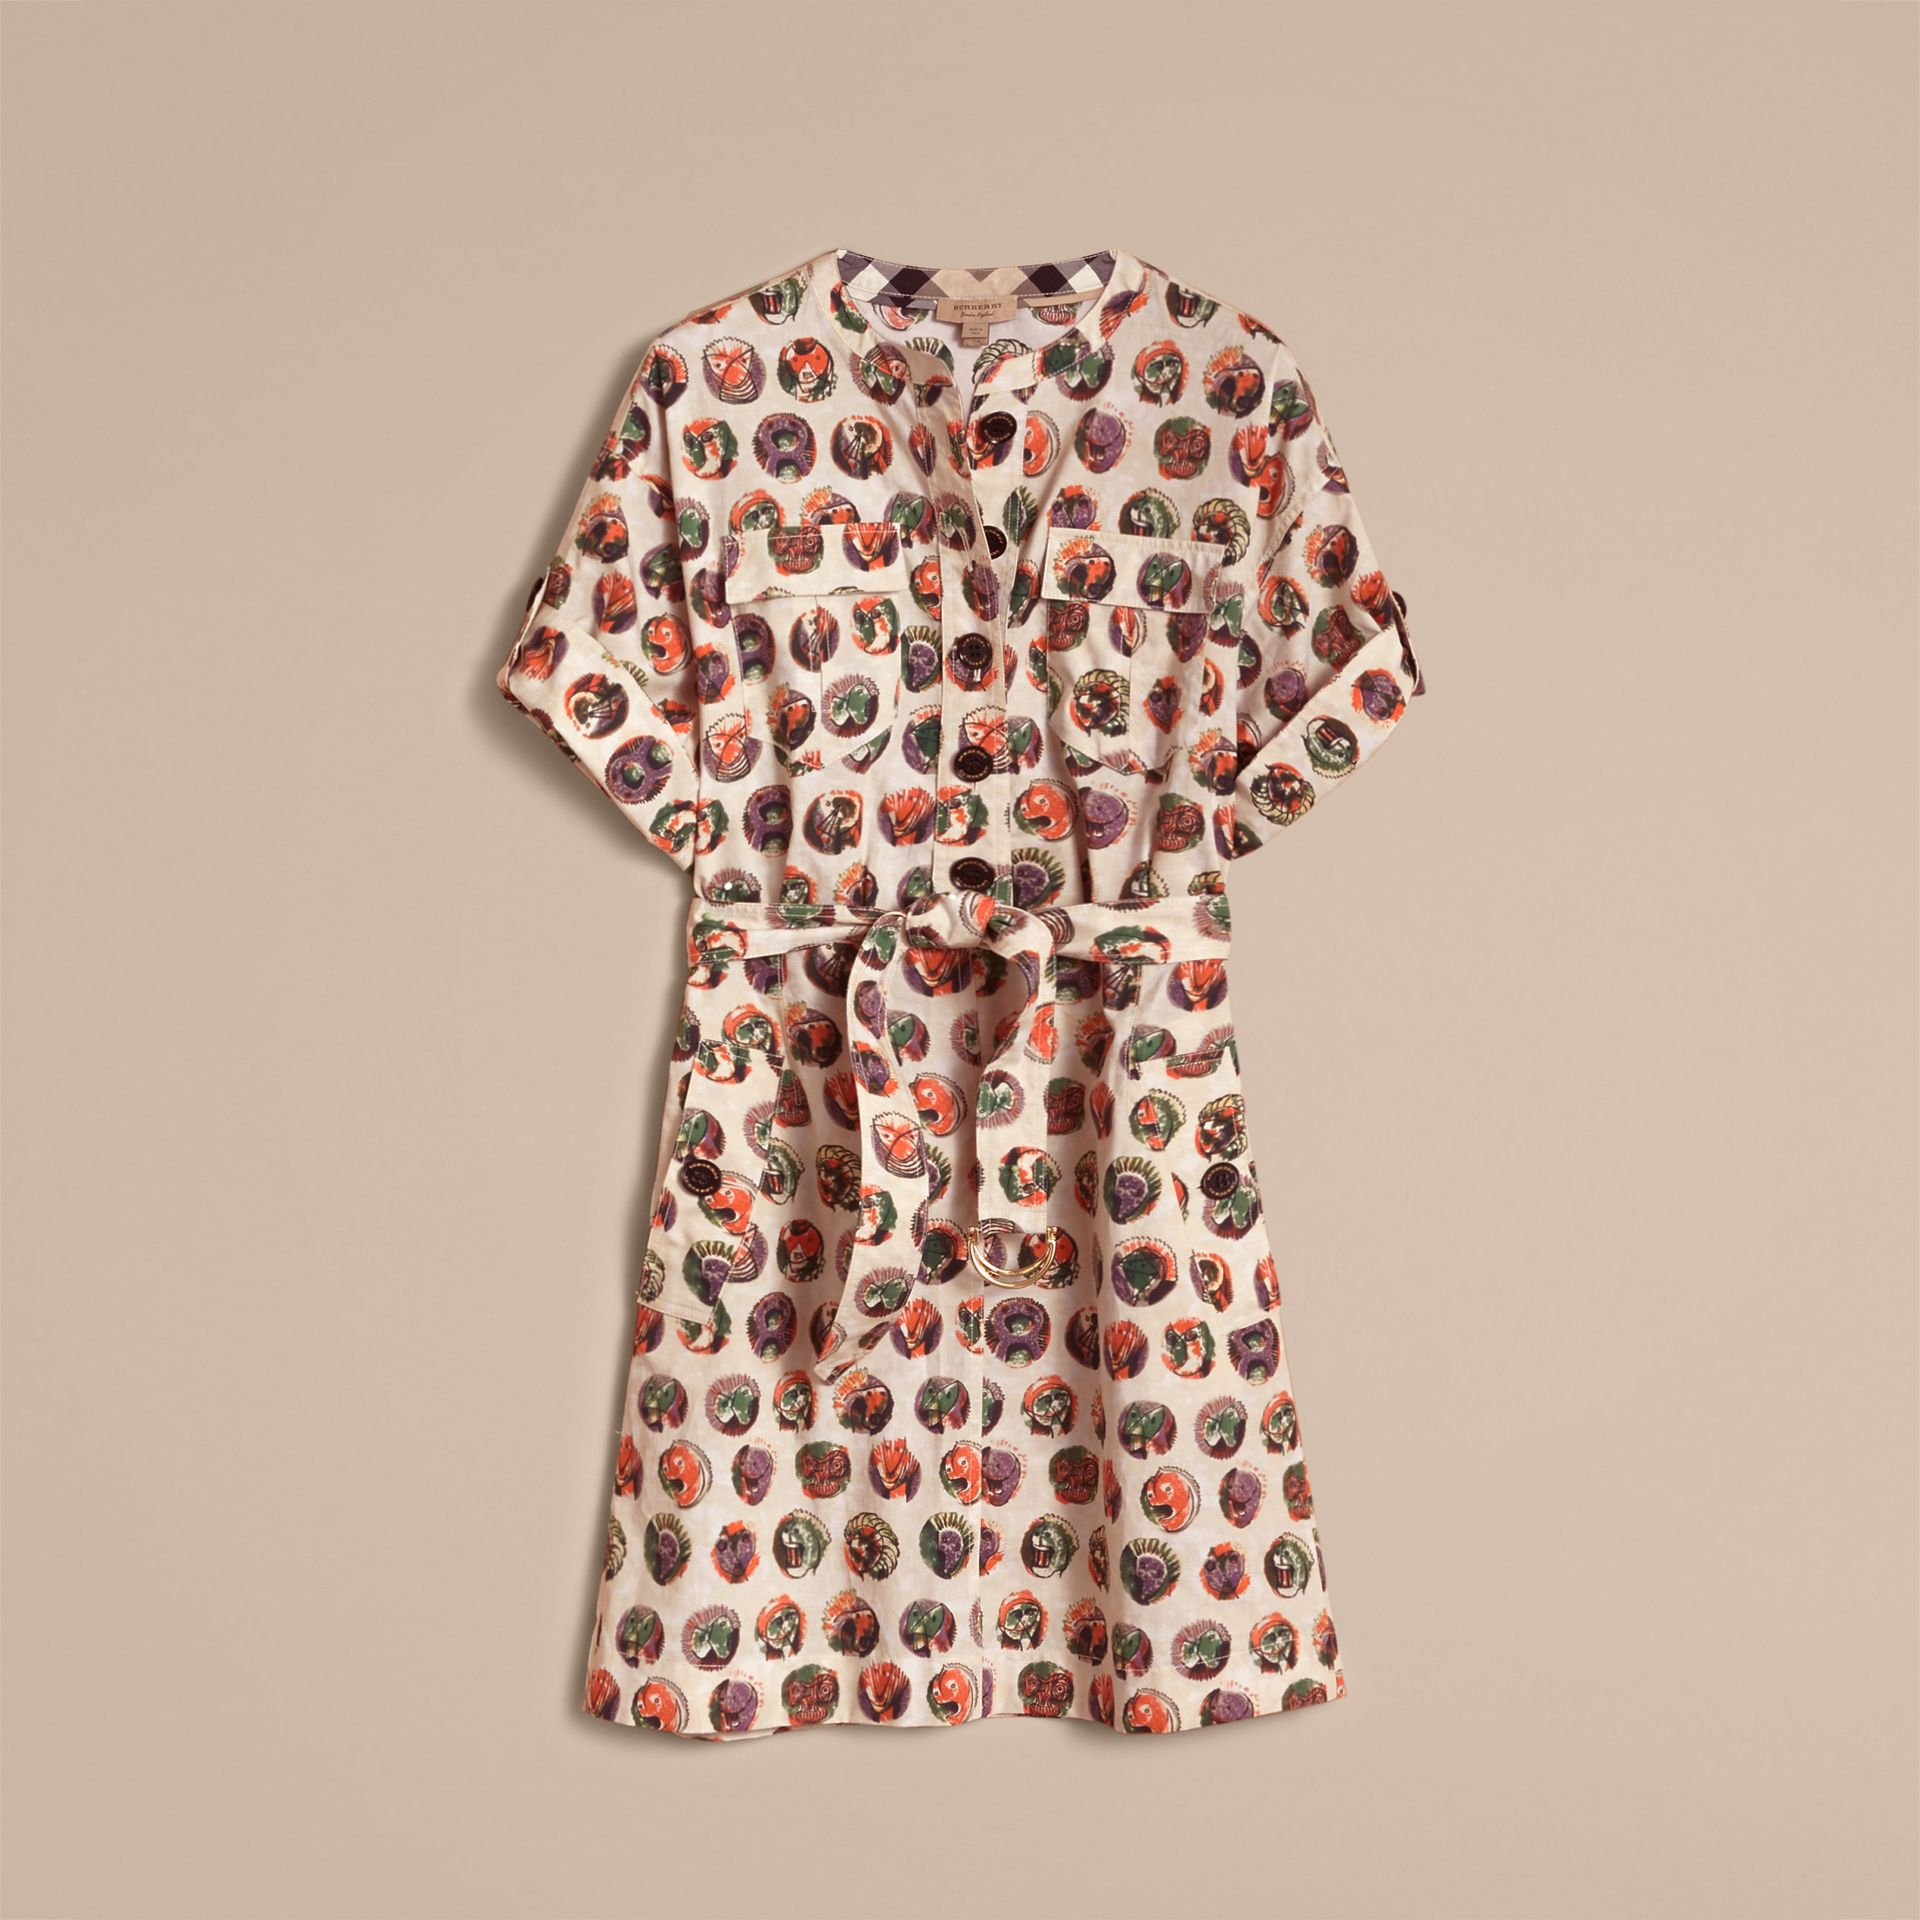 Pallas Heads 印花伸縮棉質襯衫式洋裝 (自然白) - 女款 | Burberry - 圖庫照片 3